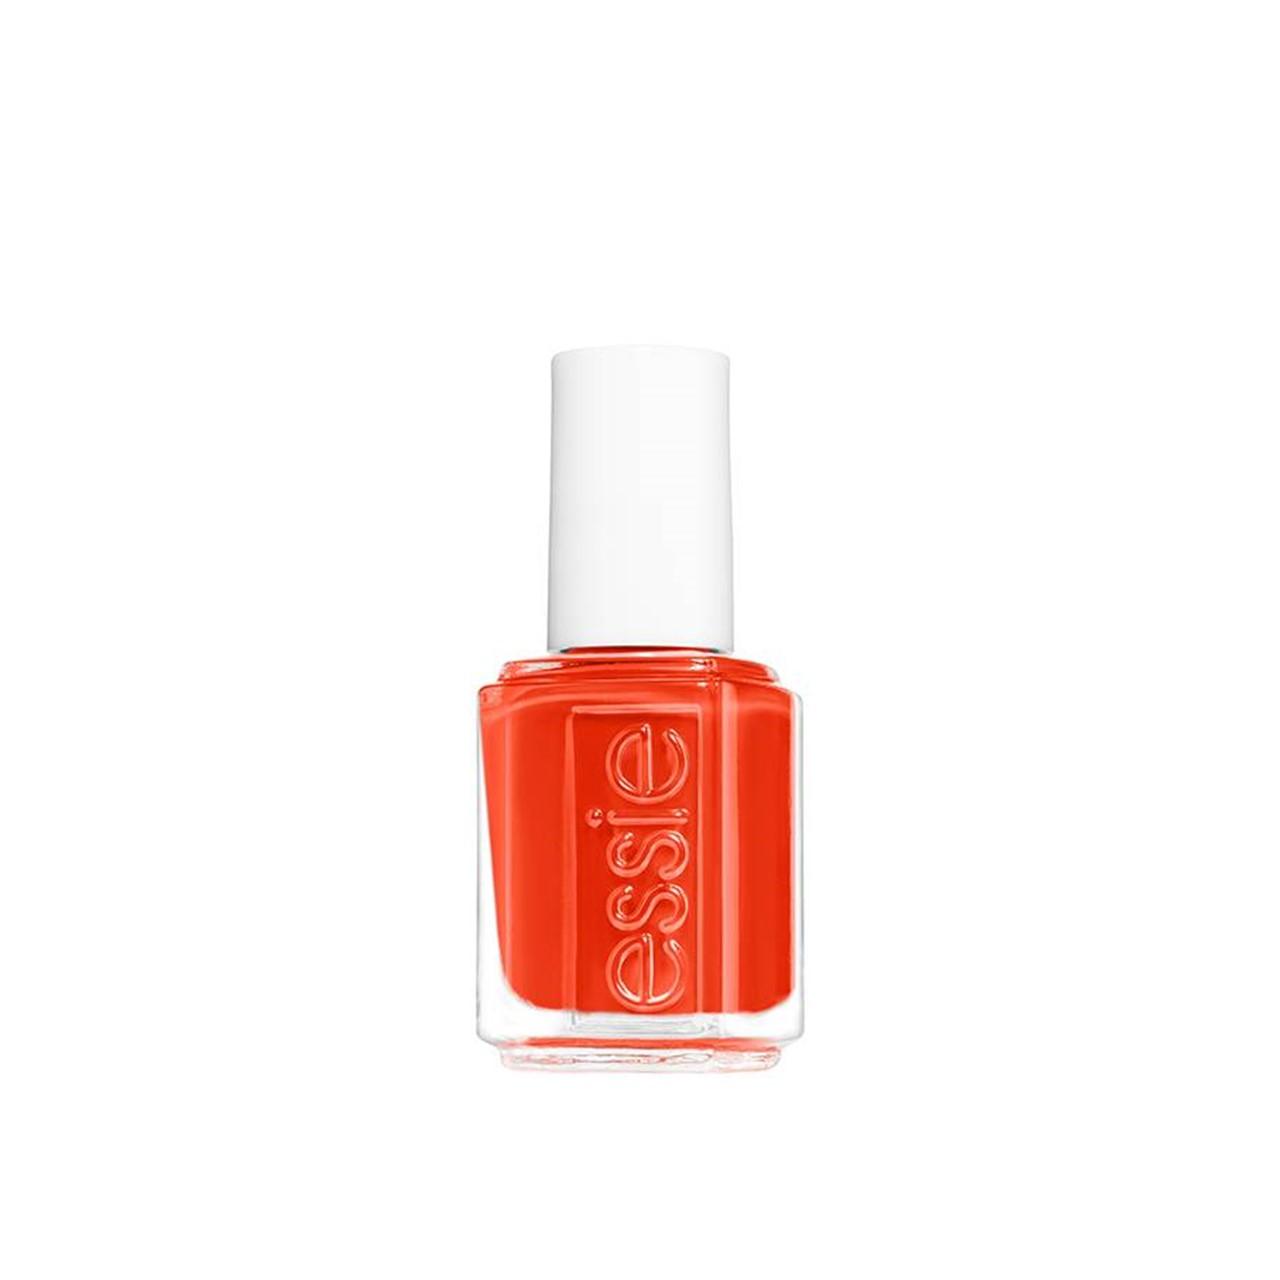 Best Nail Polish Colors For Summer essie Enamel Nail Polish 67 Meet Me At Sunset